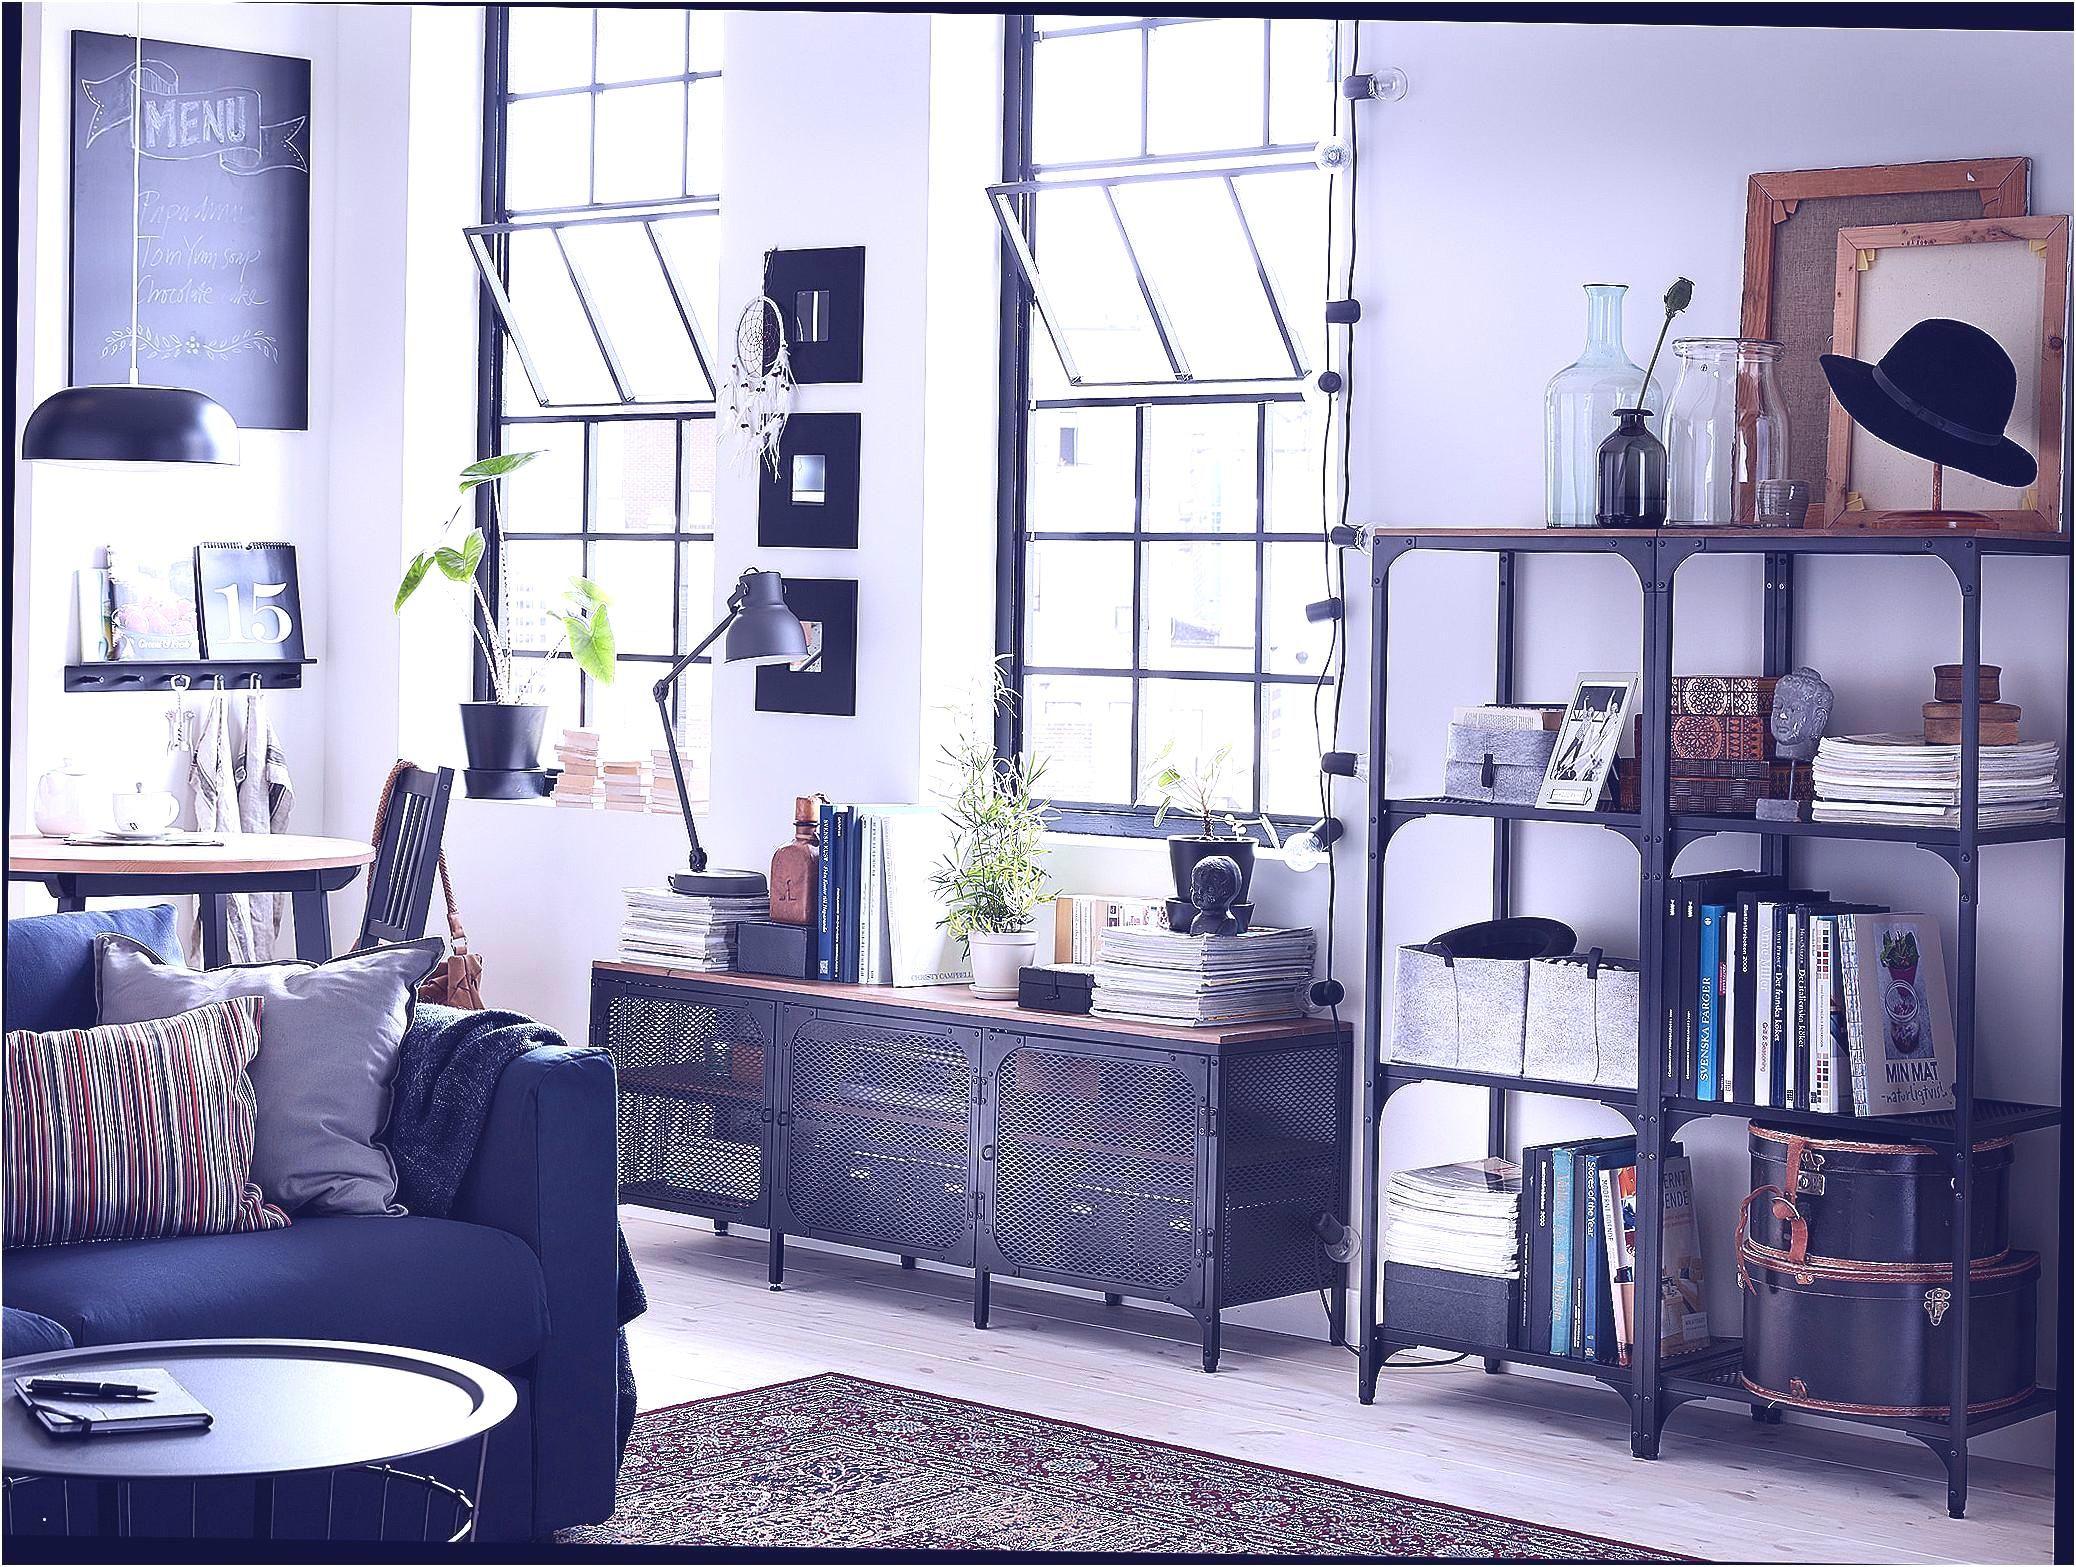 Elegant Living Room Furniture From Ikea in 2020   Living ...